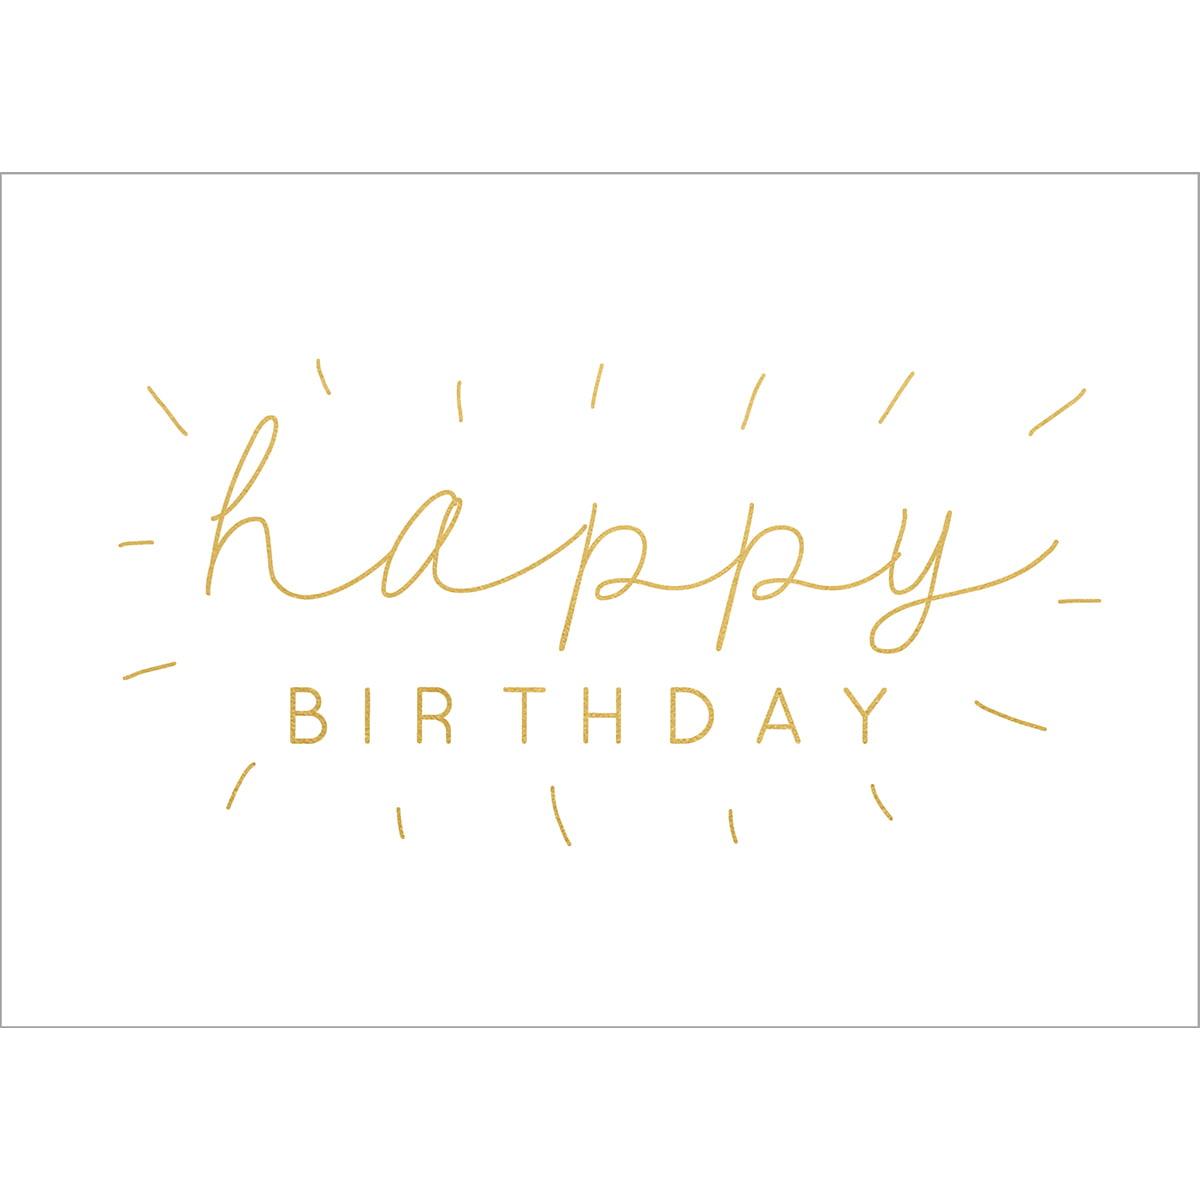 "Kaisercraft KS672 Kaisercraft Kaiser Style Greeting Card W/Envelope 5""X7"" - HBD (Happy Birthday)"